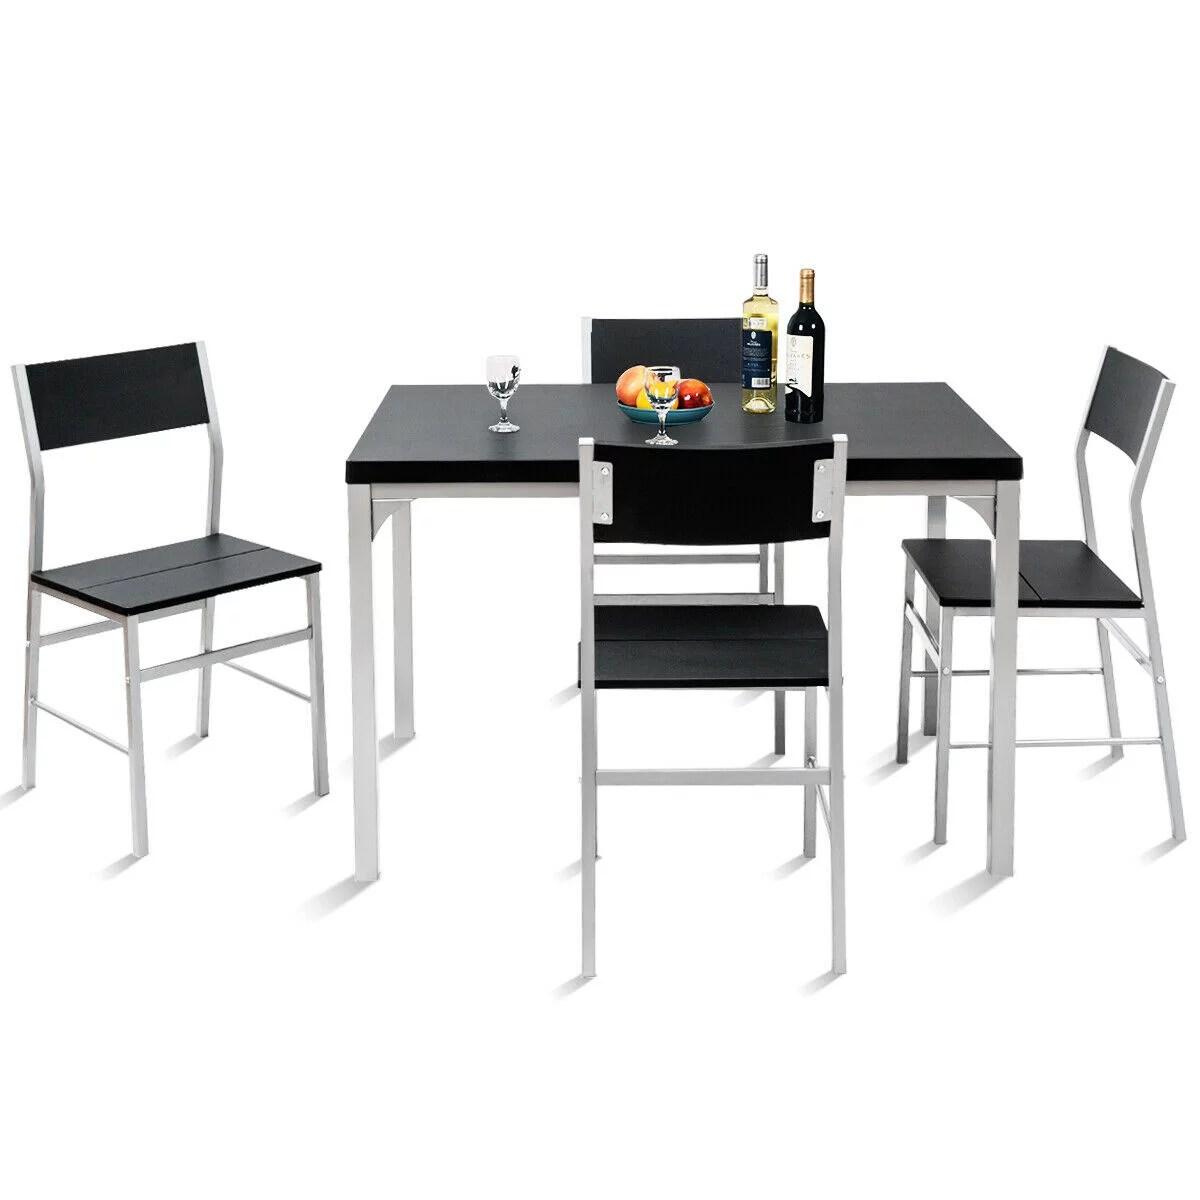 Costway 5 Piece Dining Table Chairs Set Wood Metal Kitchen Breakfast Furniture Black Walmart Com Walmart Com